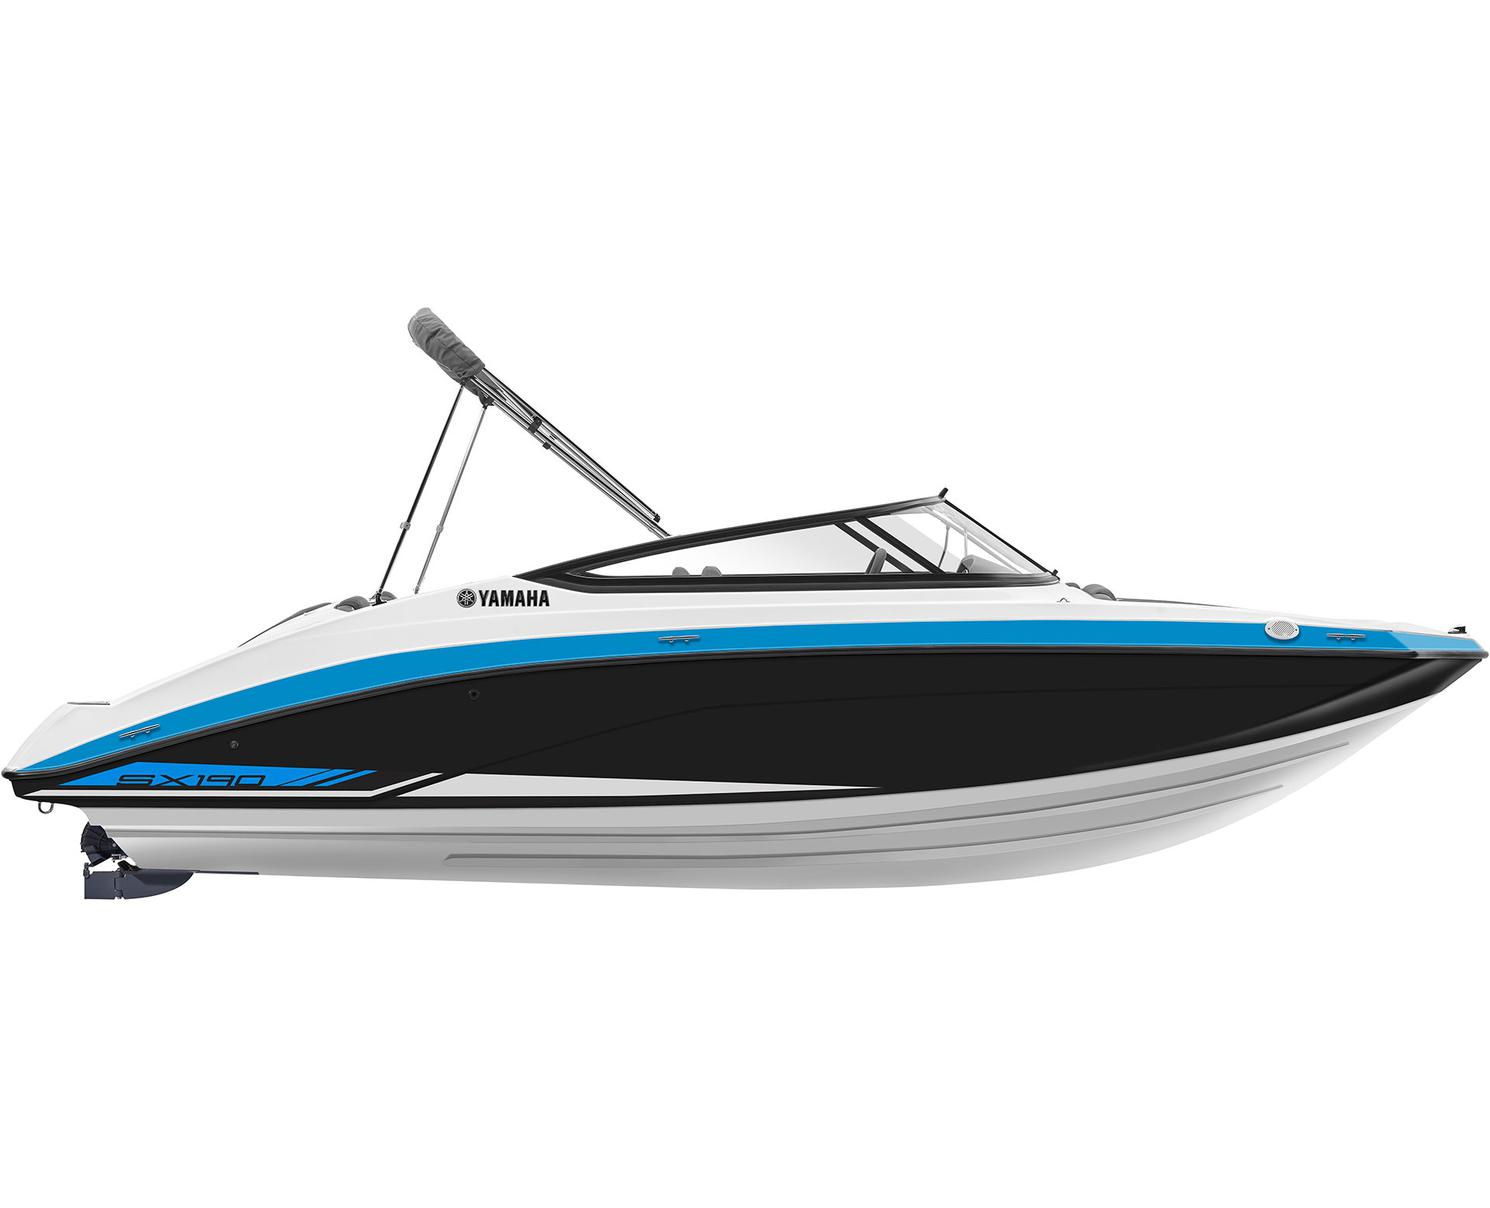 2022 Yamaha SX190 Sapphire